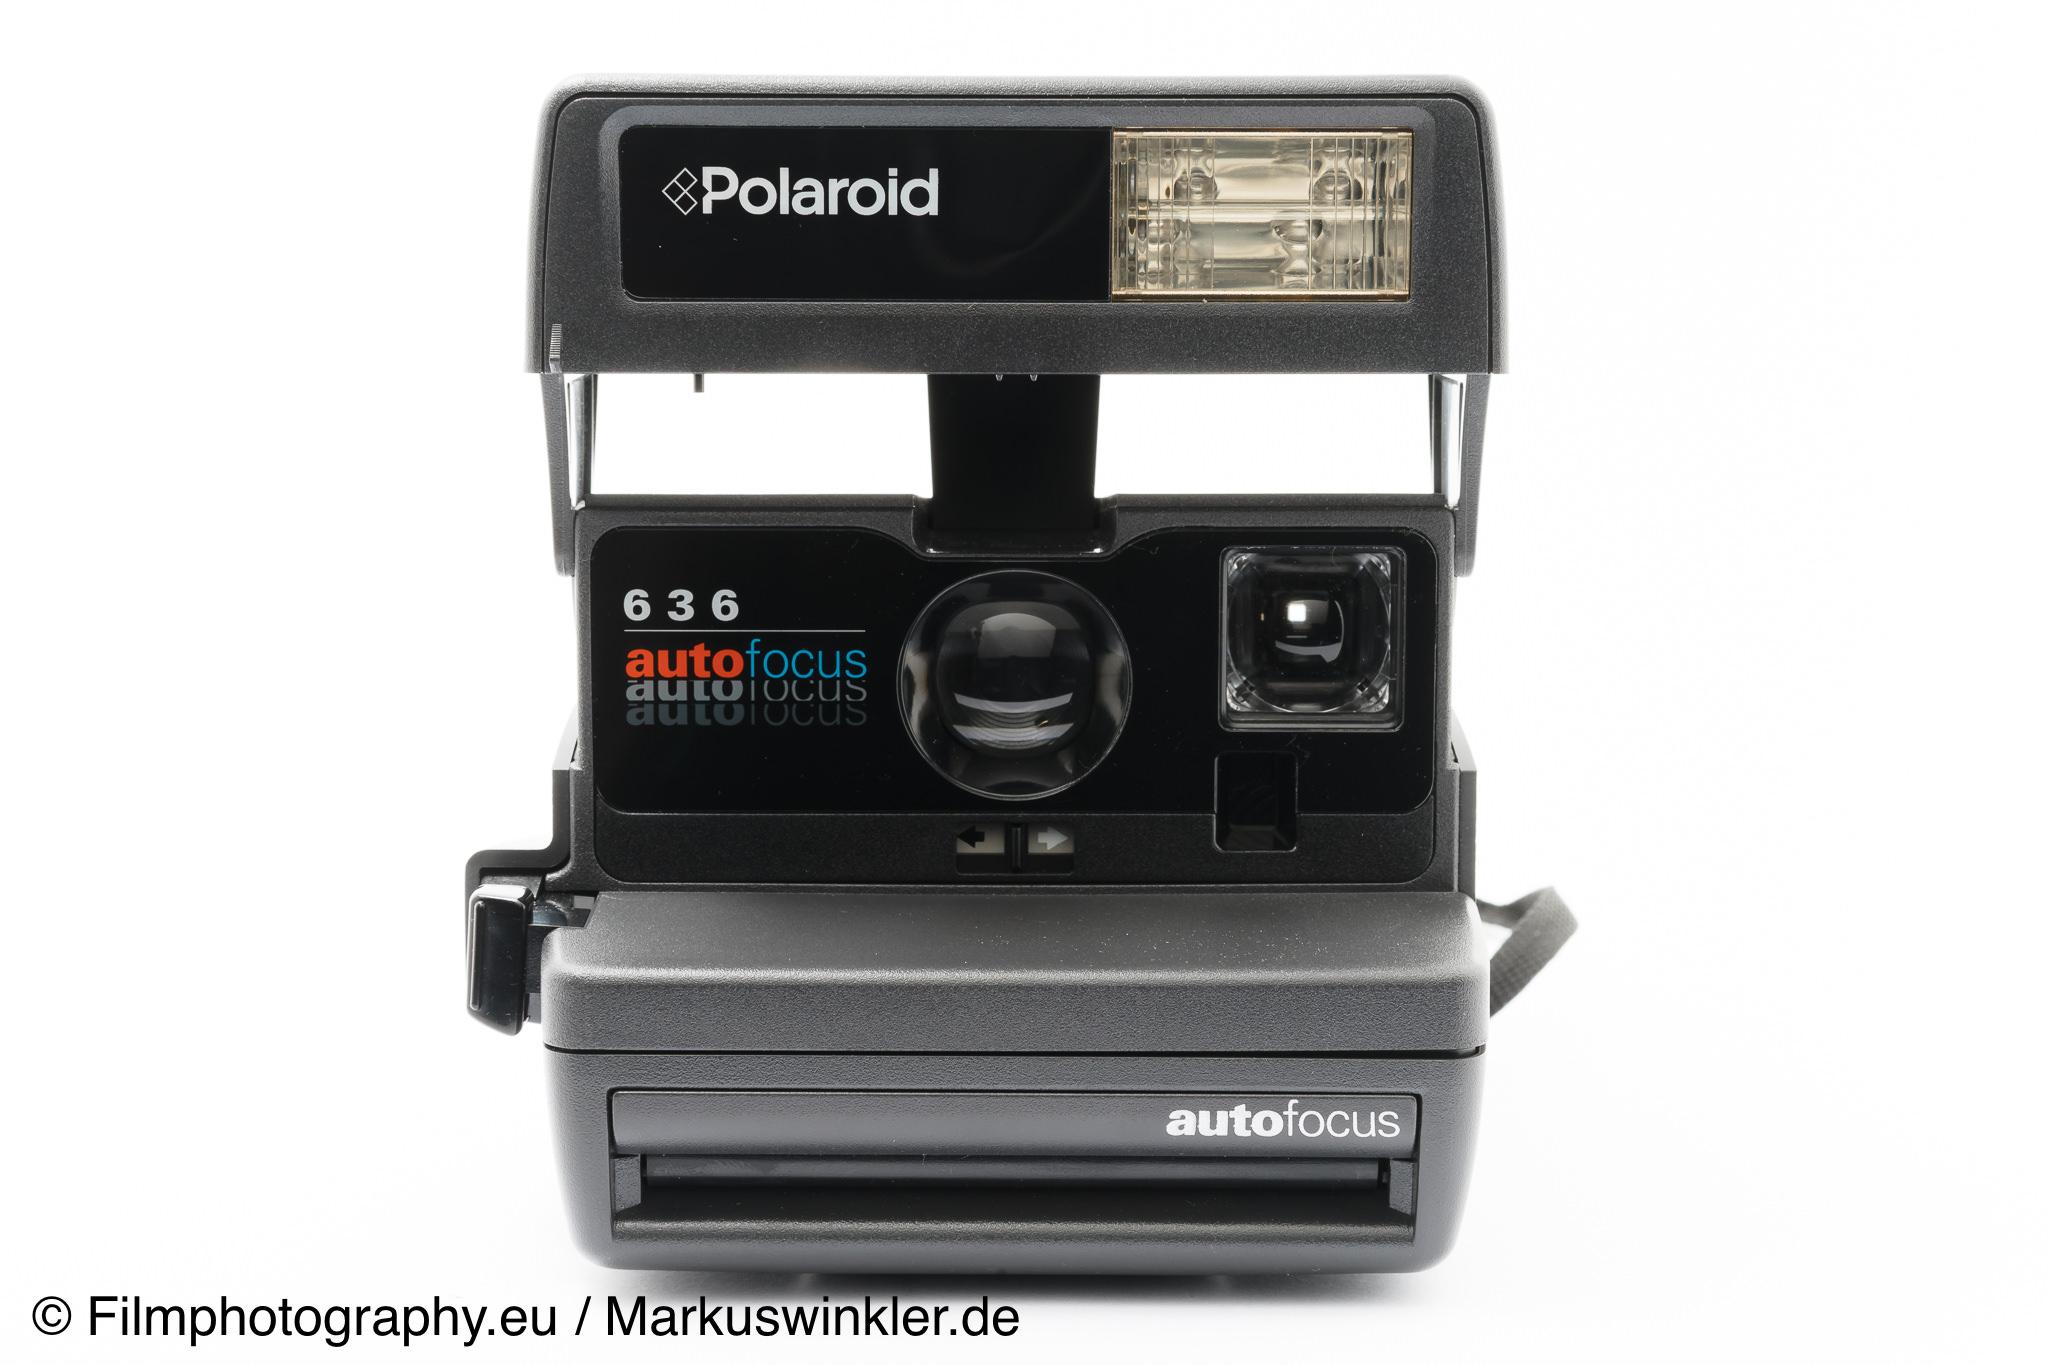 polaroid 636 autofocus 600 sofortbildkamera. Black Bedroom Furniture Sets. Home Design Ideas